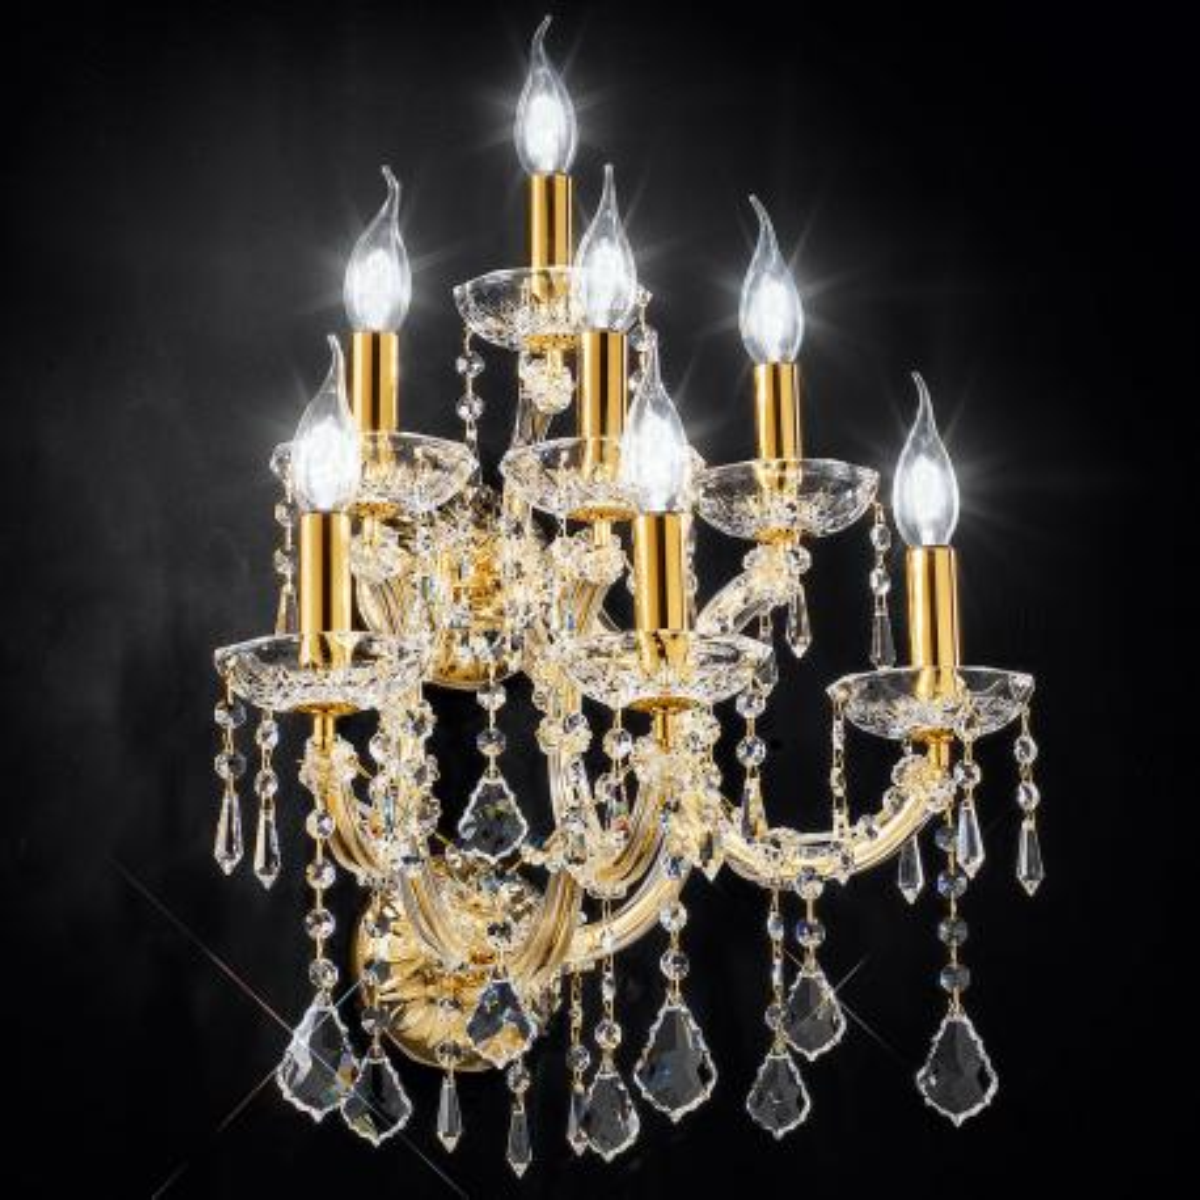 """Spilimbergo"" venezianischer kristall wandleuchte - 3+3+1 flammig - transparent mit kristal Asfour"